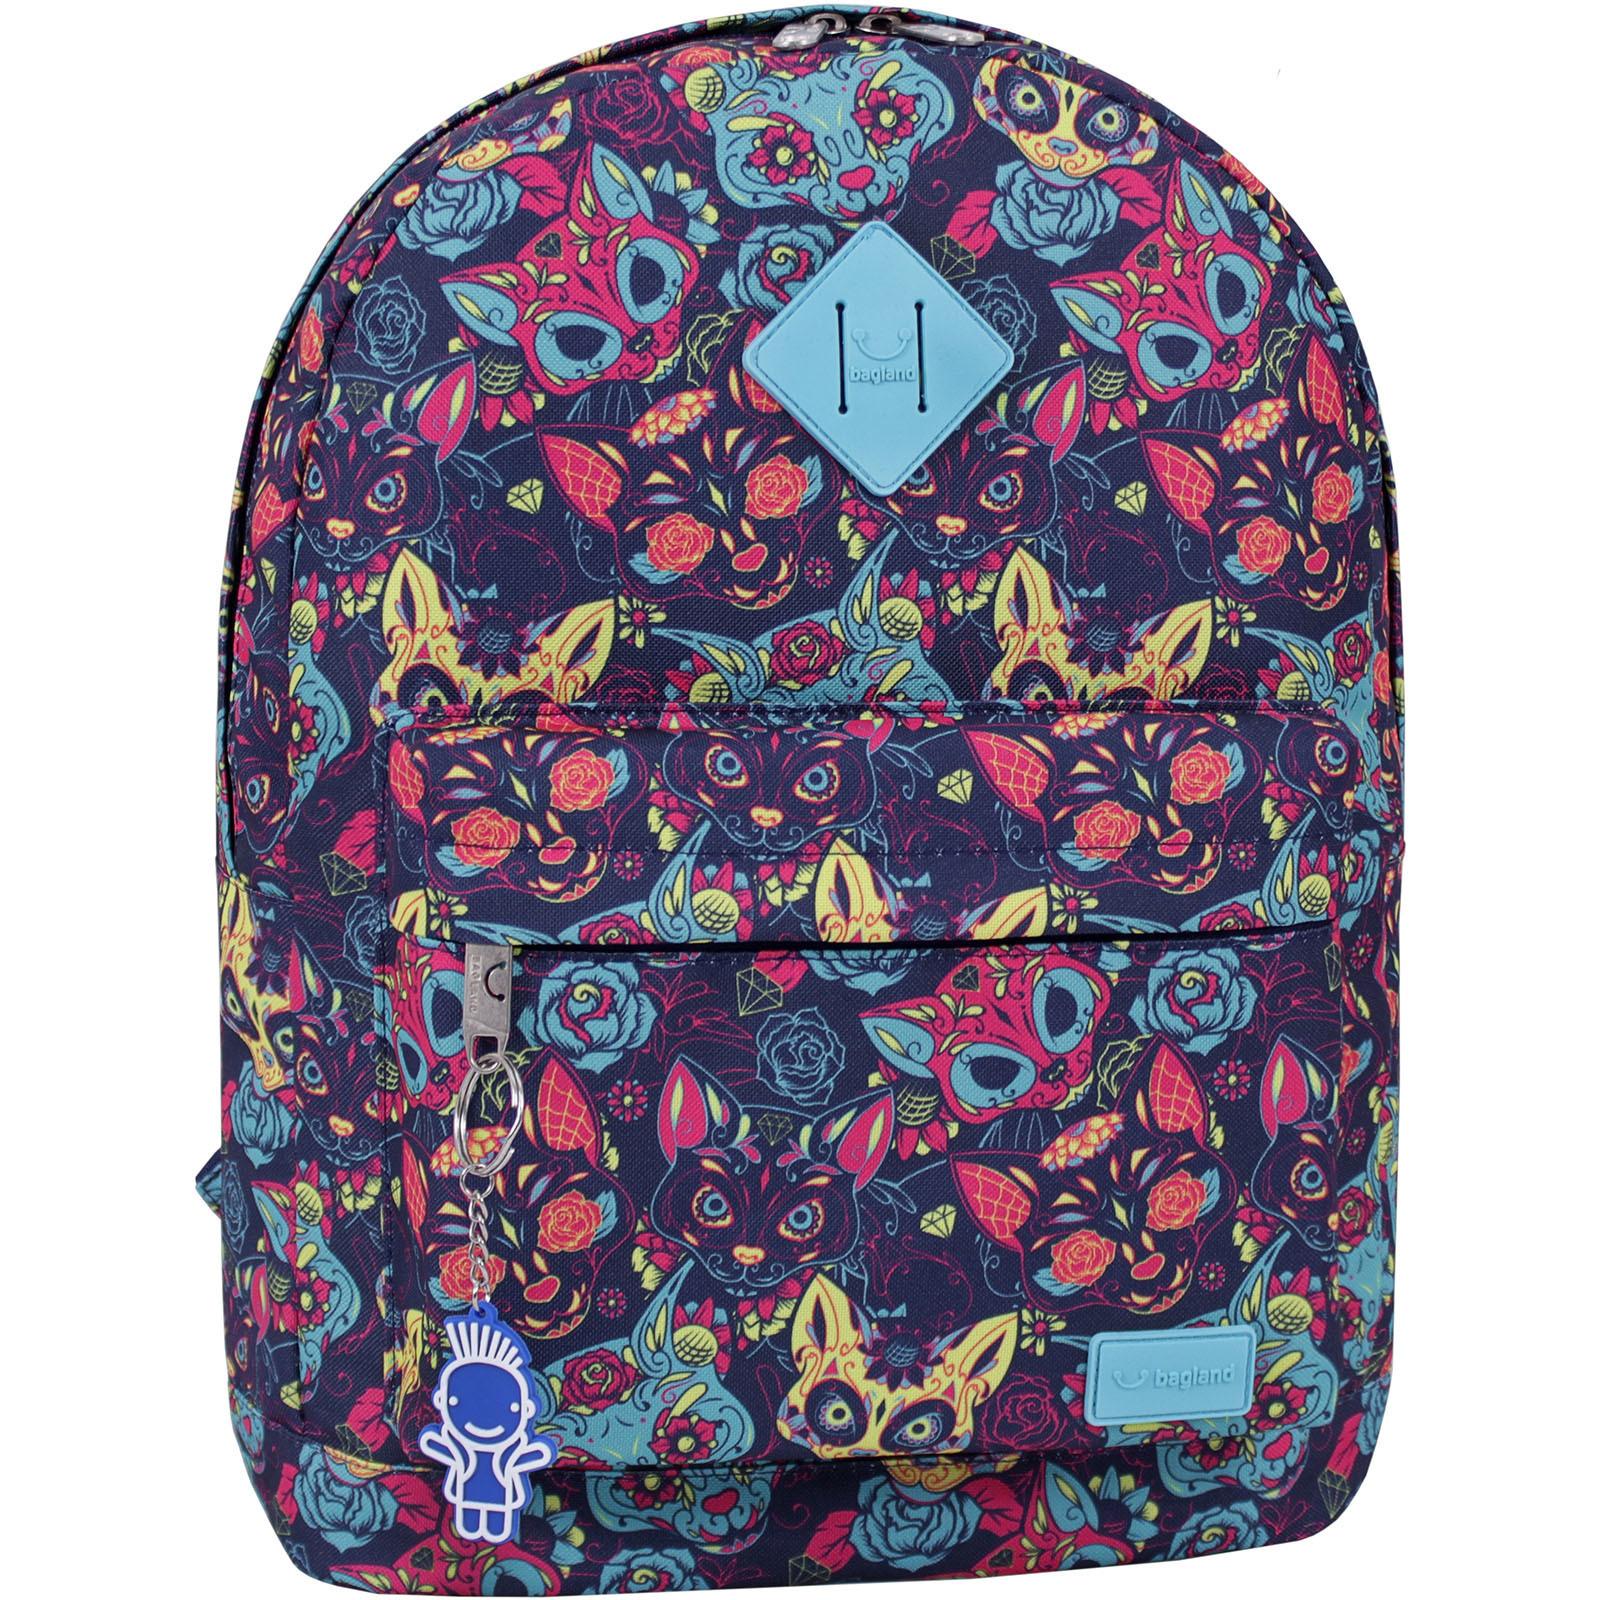 Молодежные рюкзаки Рюкзак Bagland Молодежный 17 л. сублимация 451 (00533664) IMG_9452_суб.451_.JPG